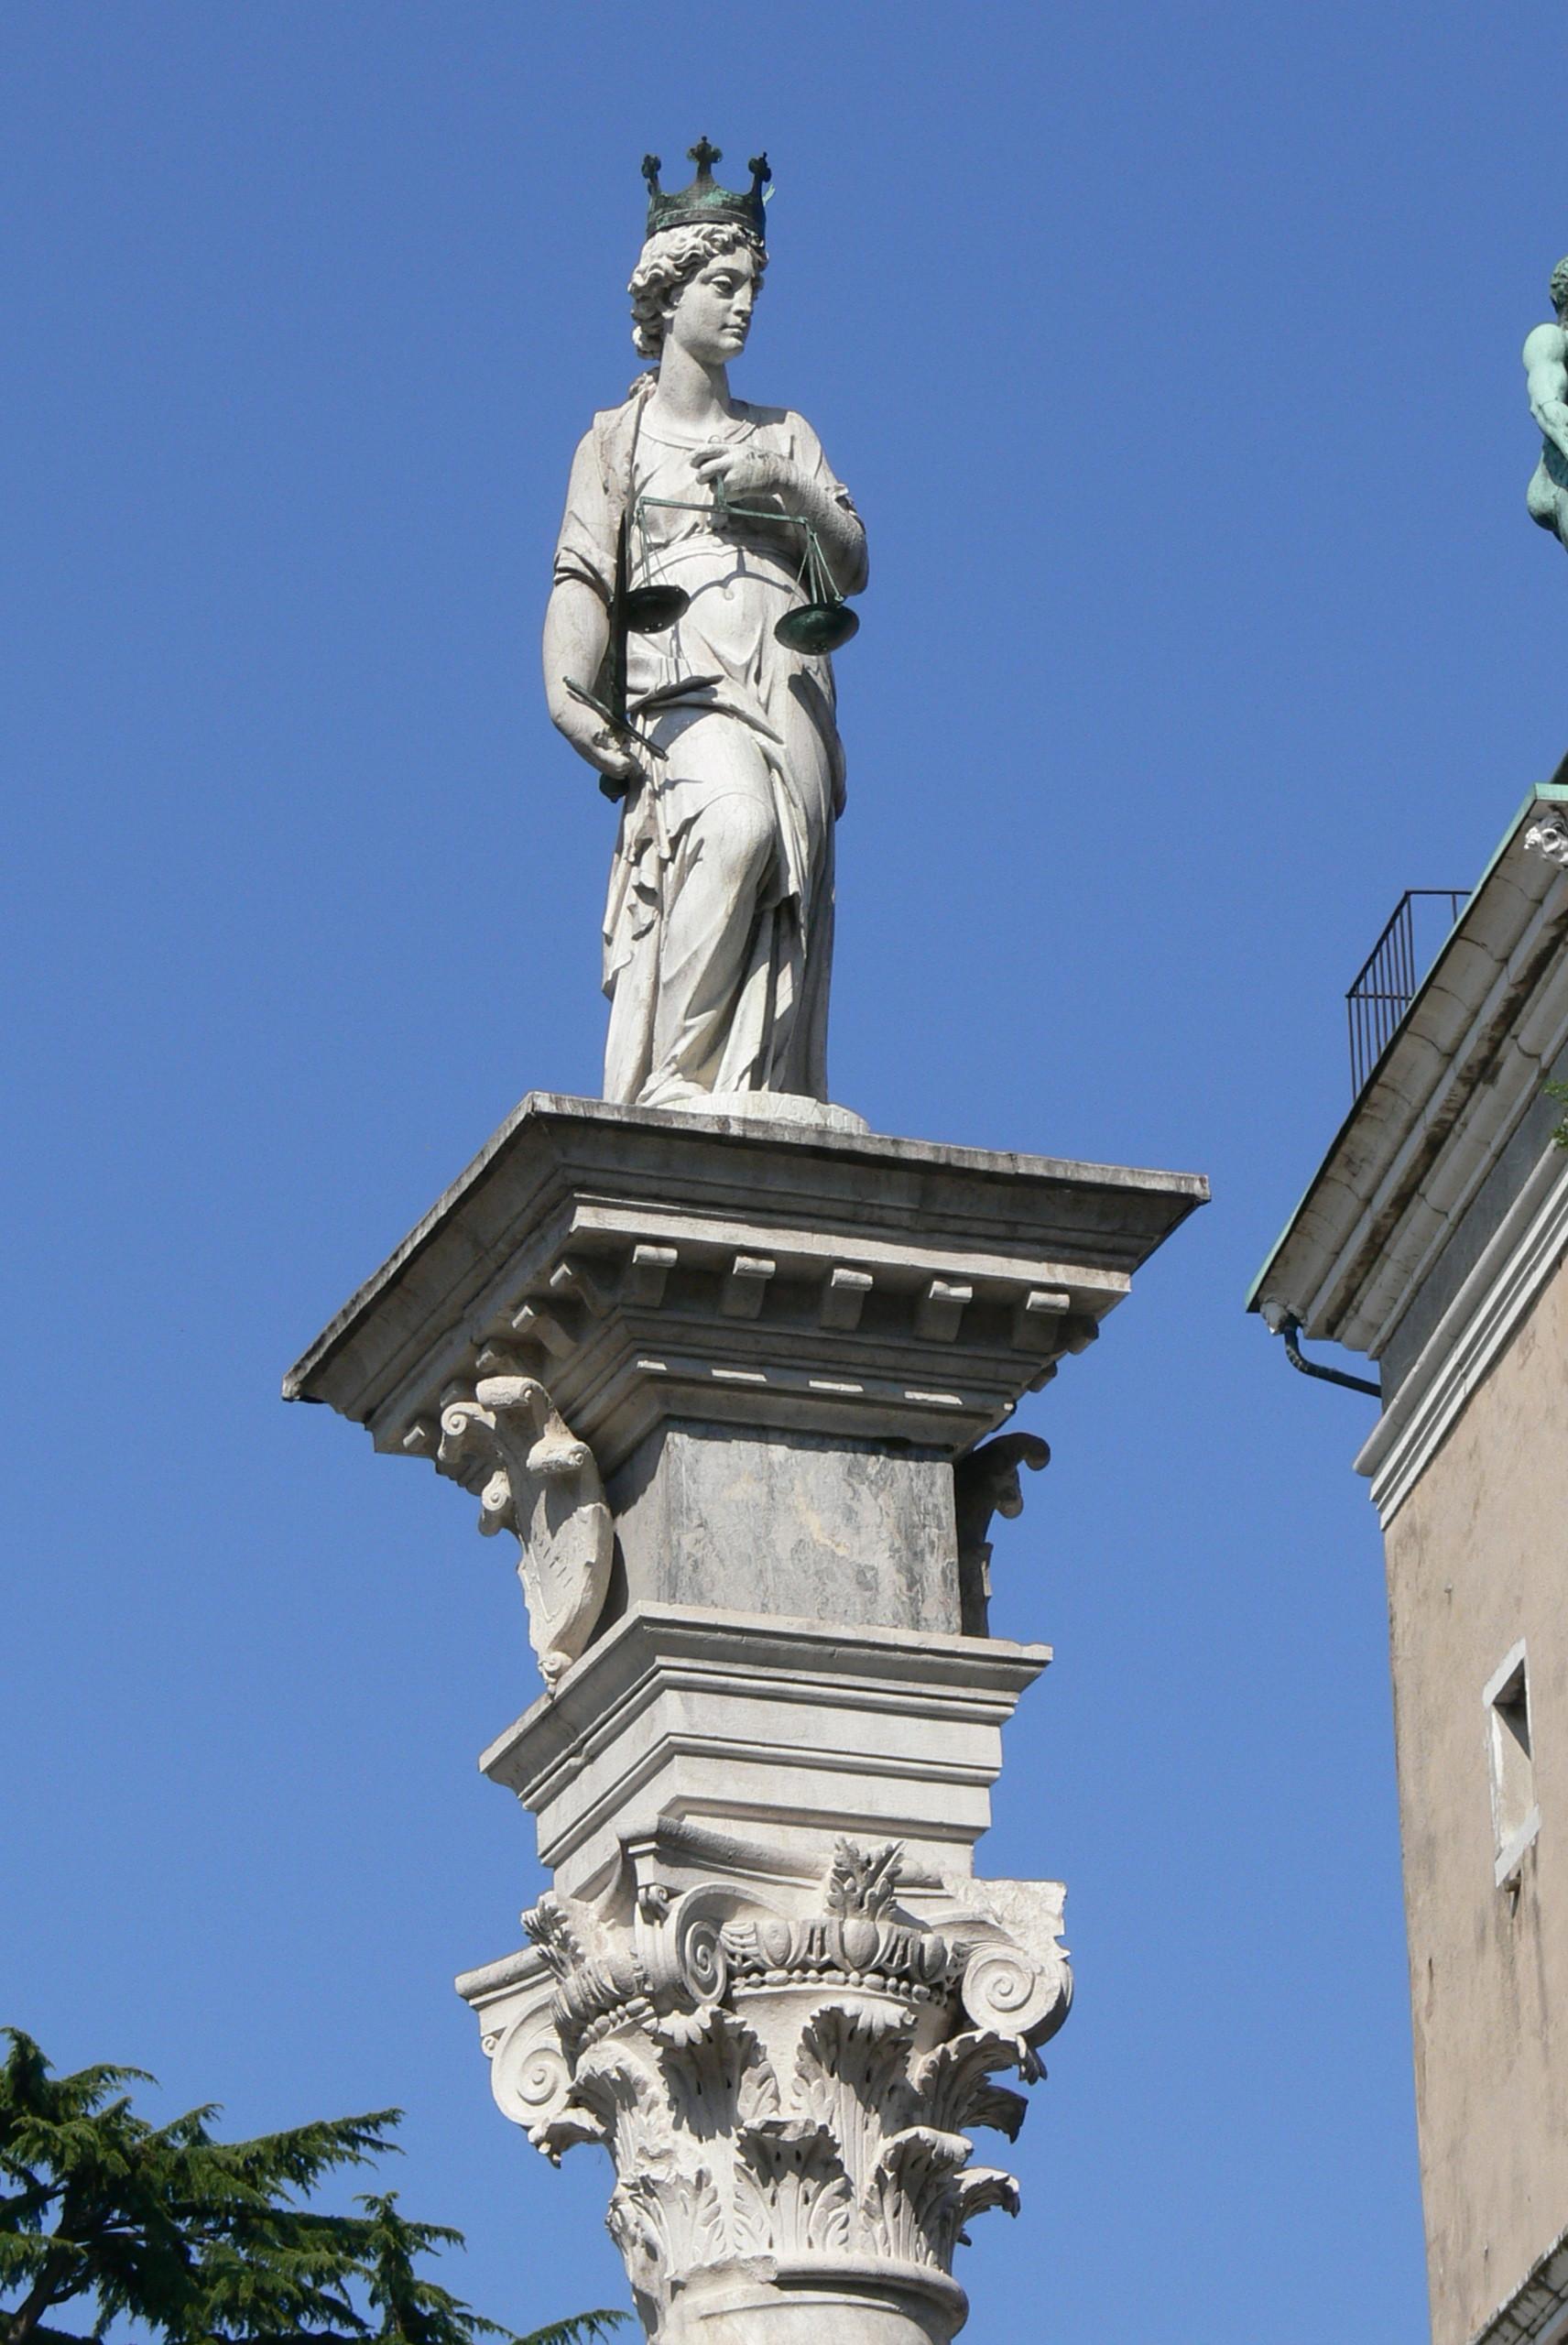 FileUdine Piazza Libert  Justitiajpg  Wikimedia Commons